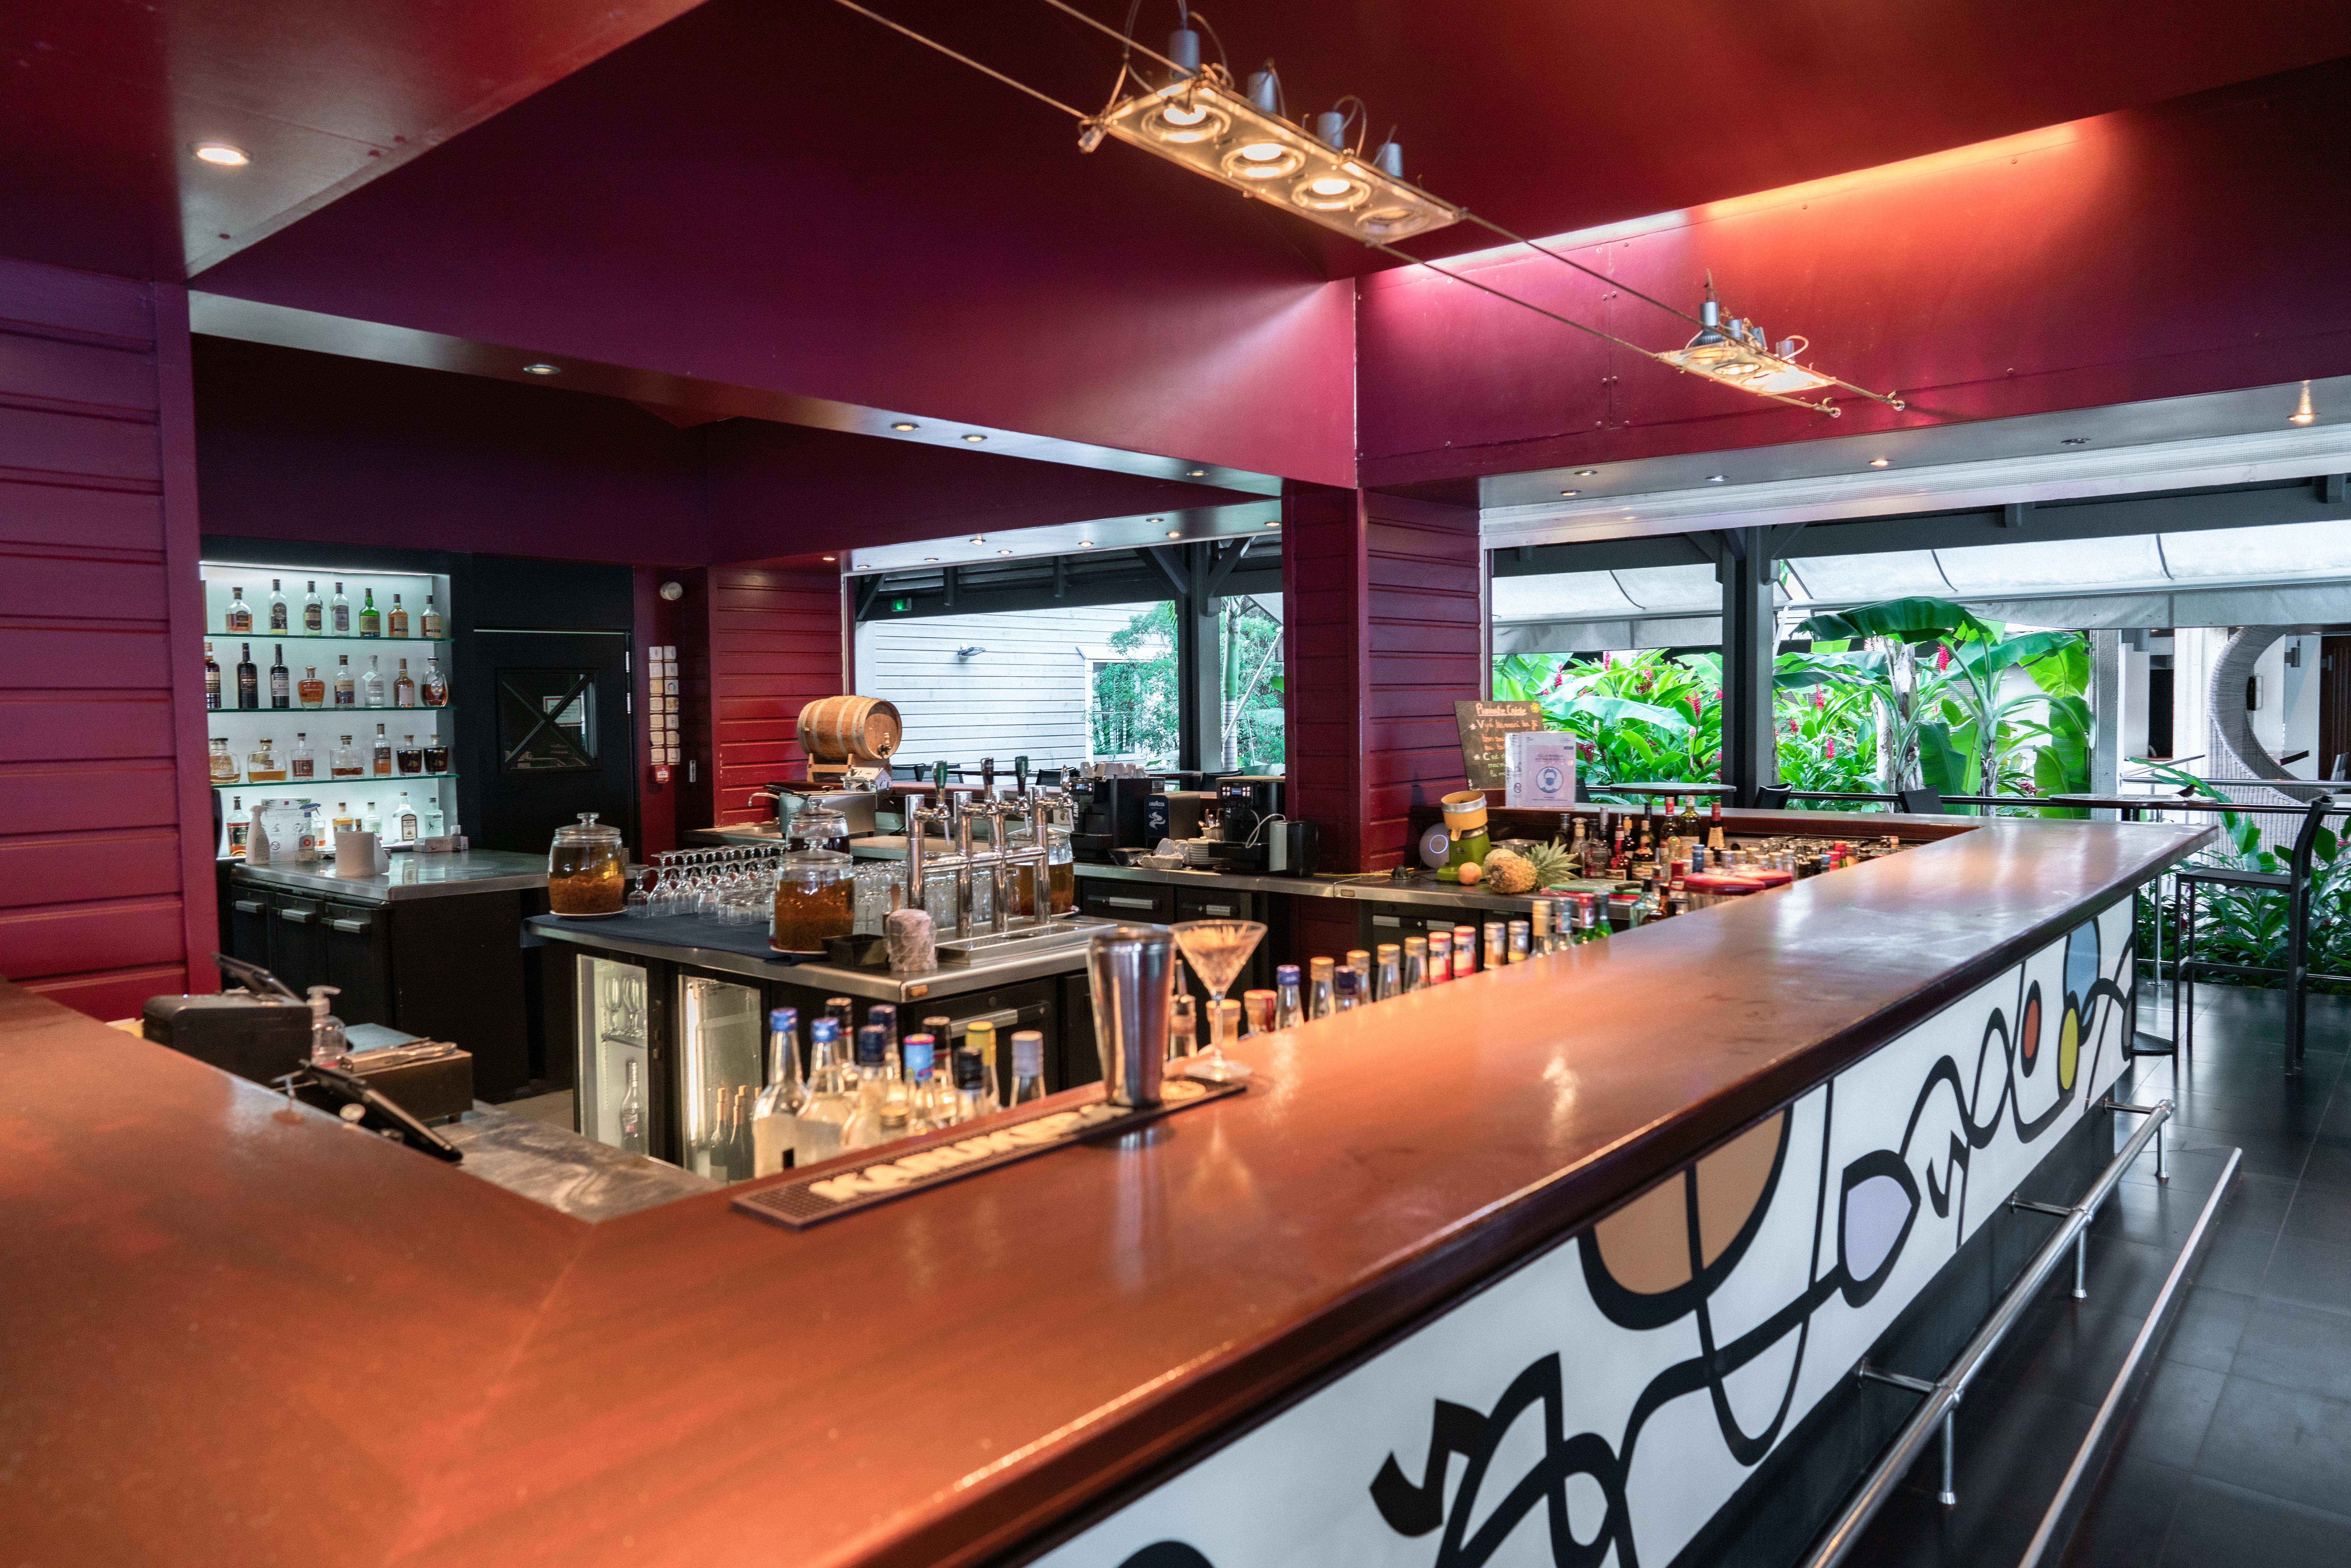 Bar La Rhumerie